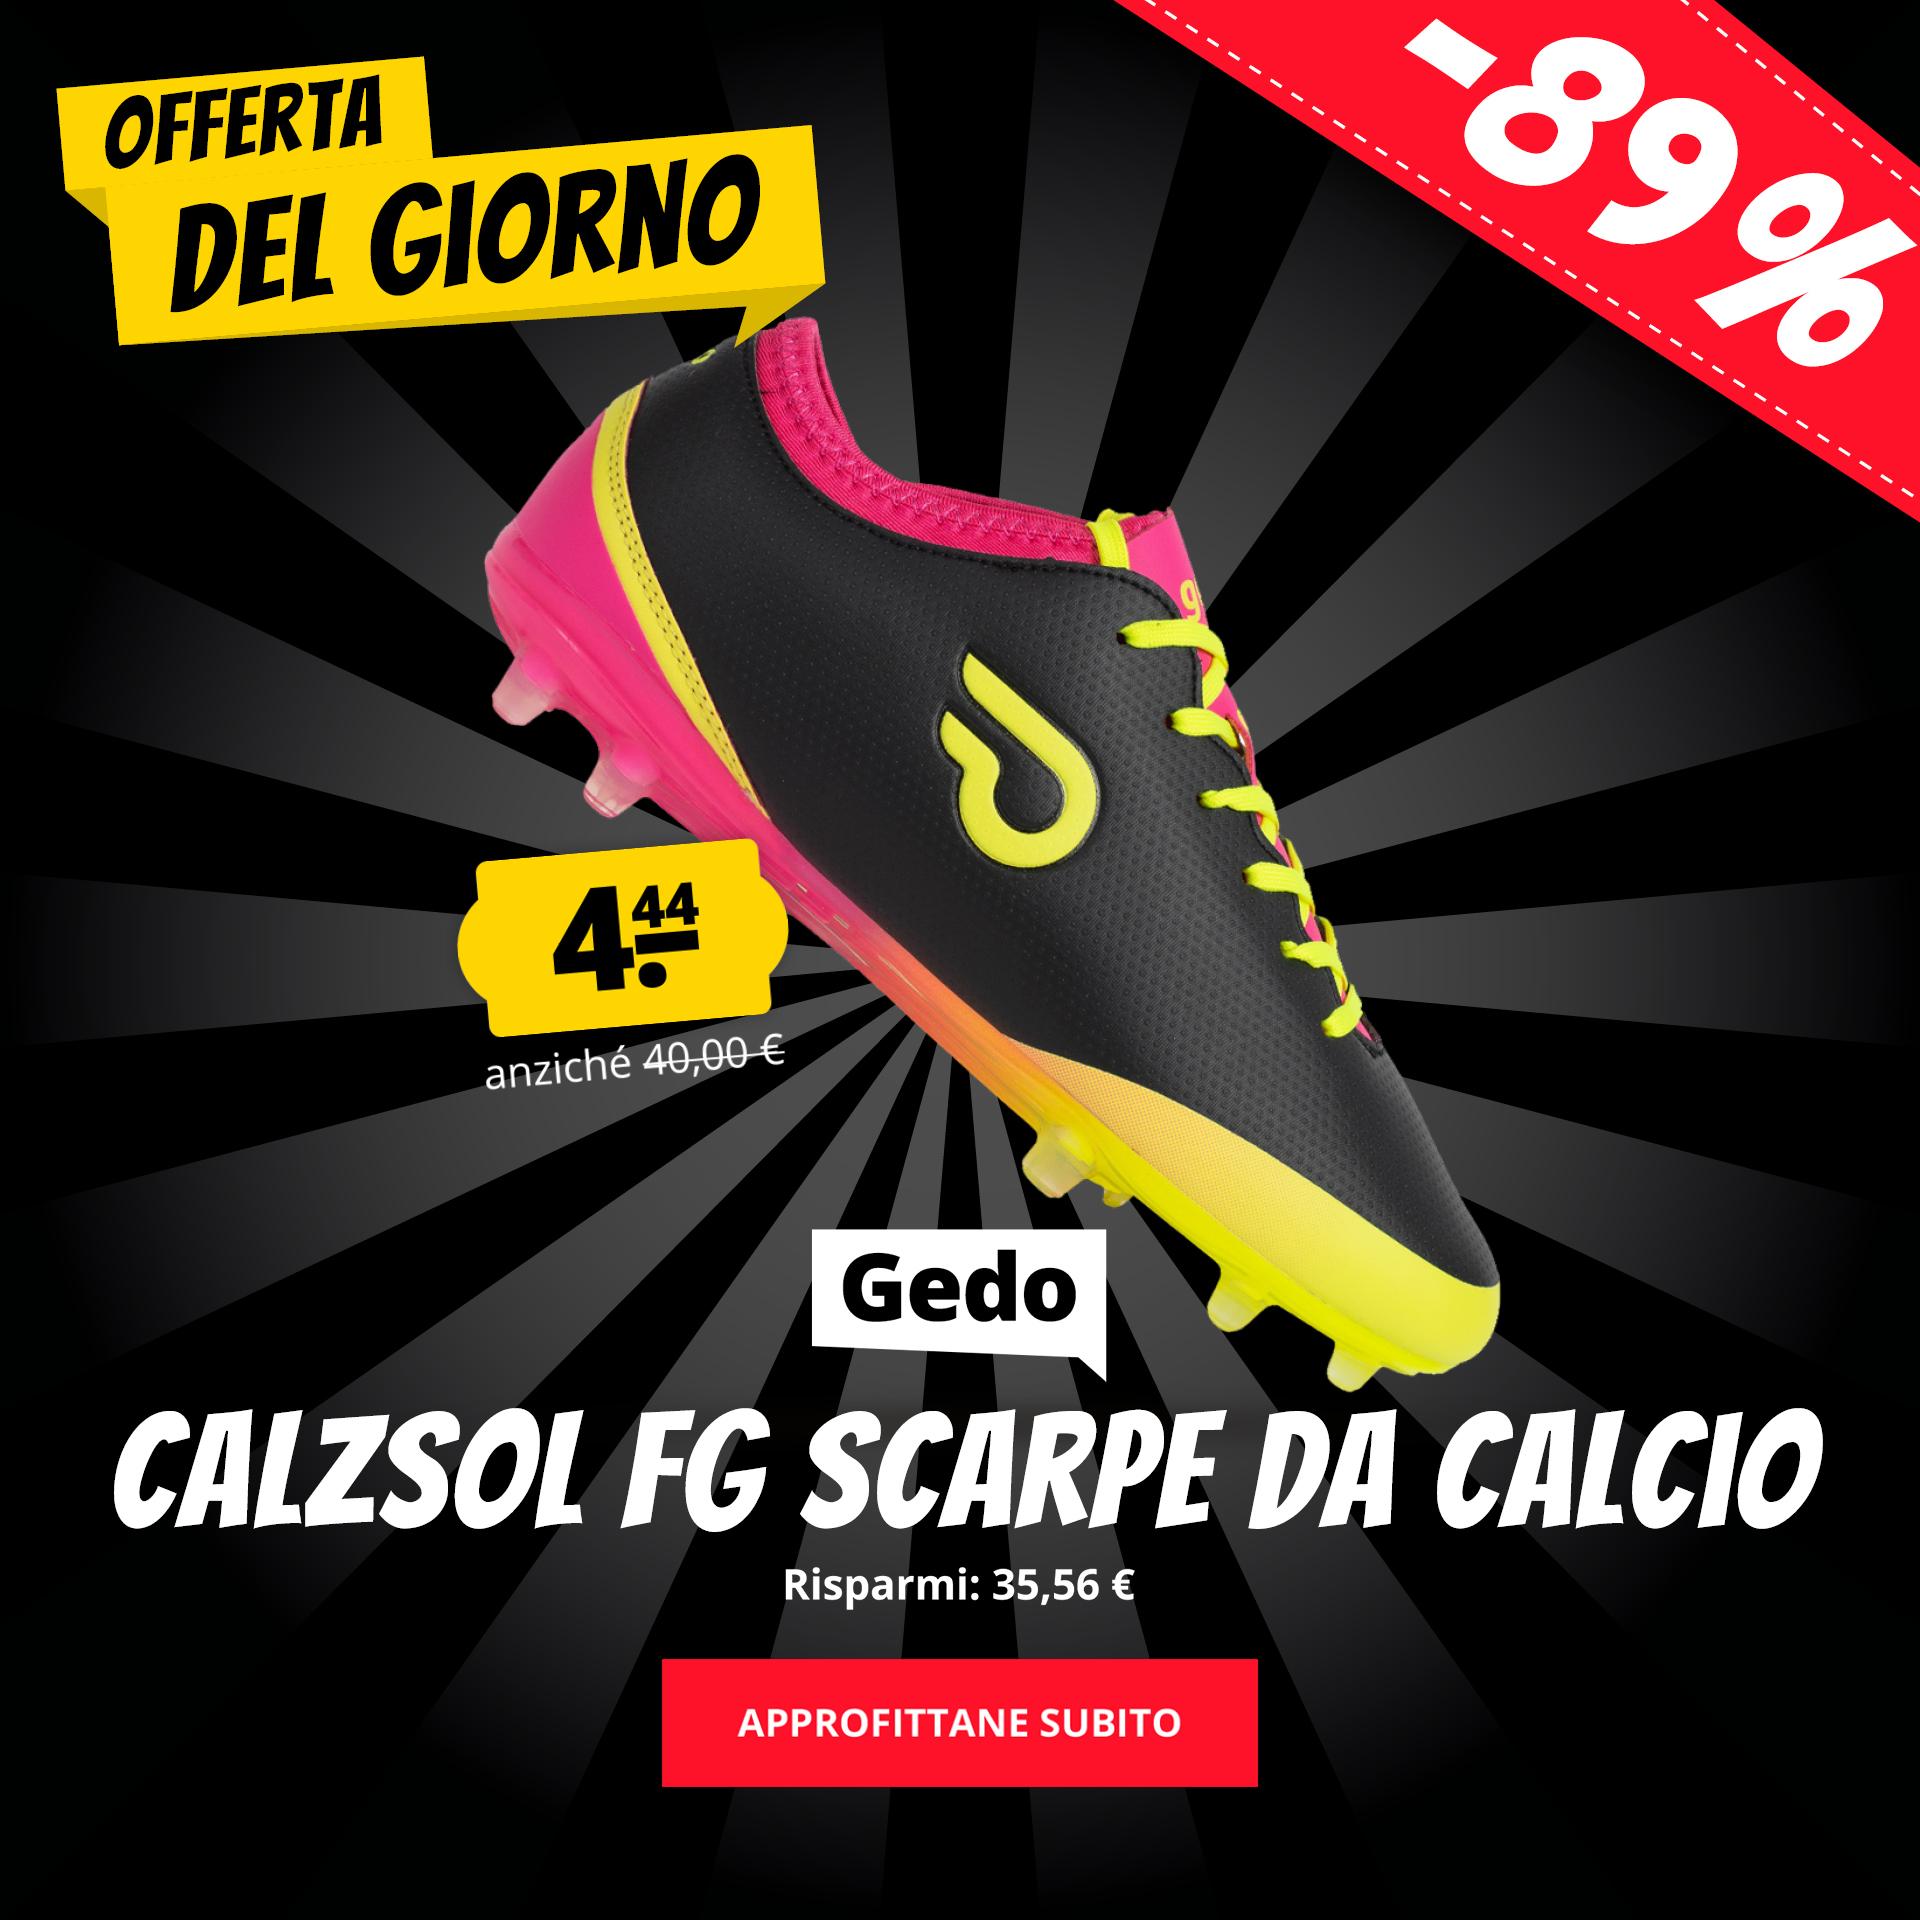 Gedo Calzsol FG Scarpe da calcio solo 4,44 €